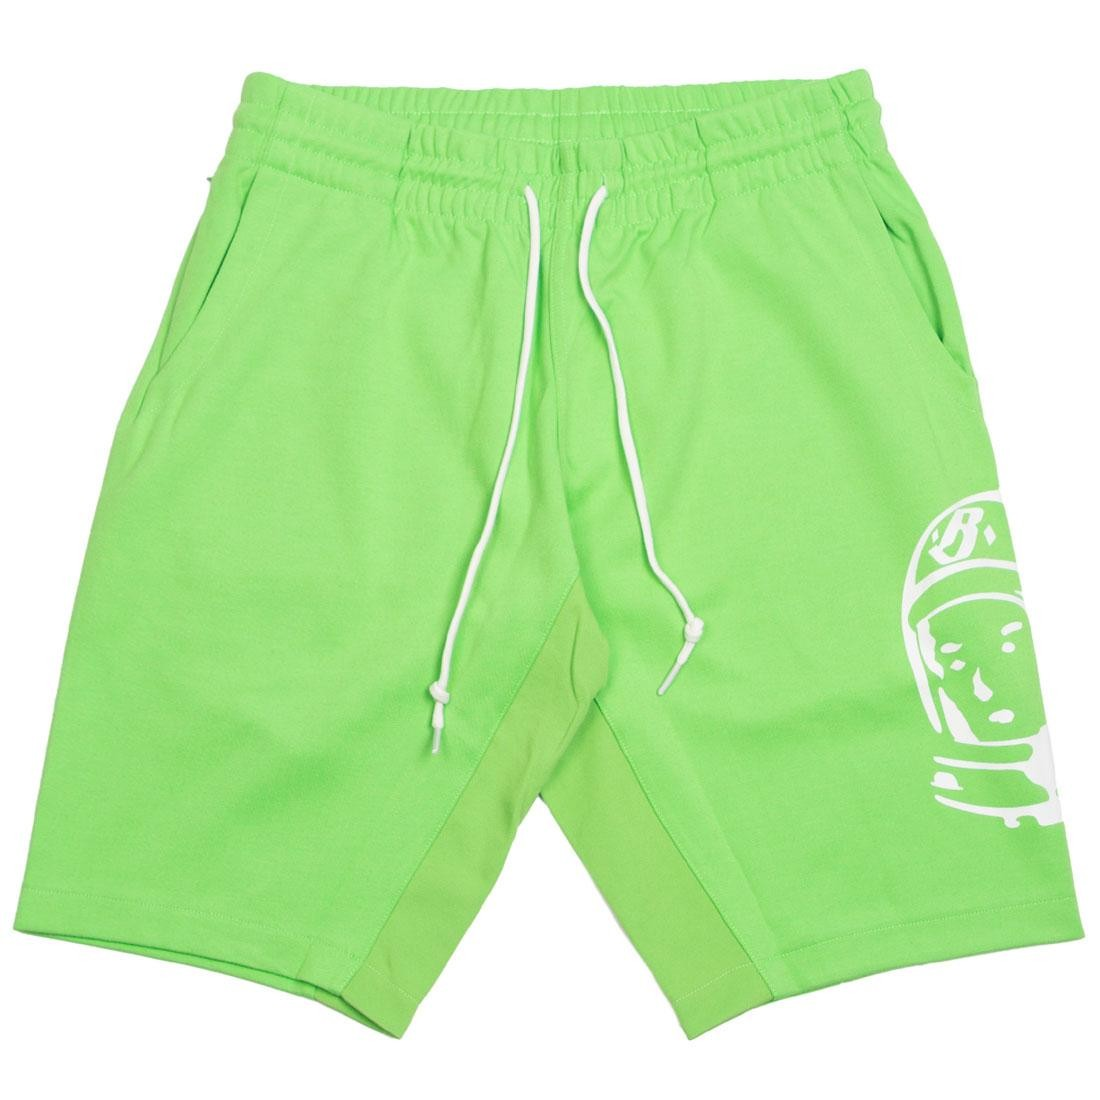 Billionaire Boys Club Men Large Helmet Shorts (green / flash)